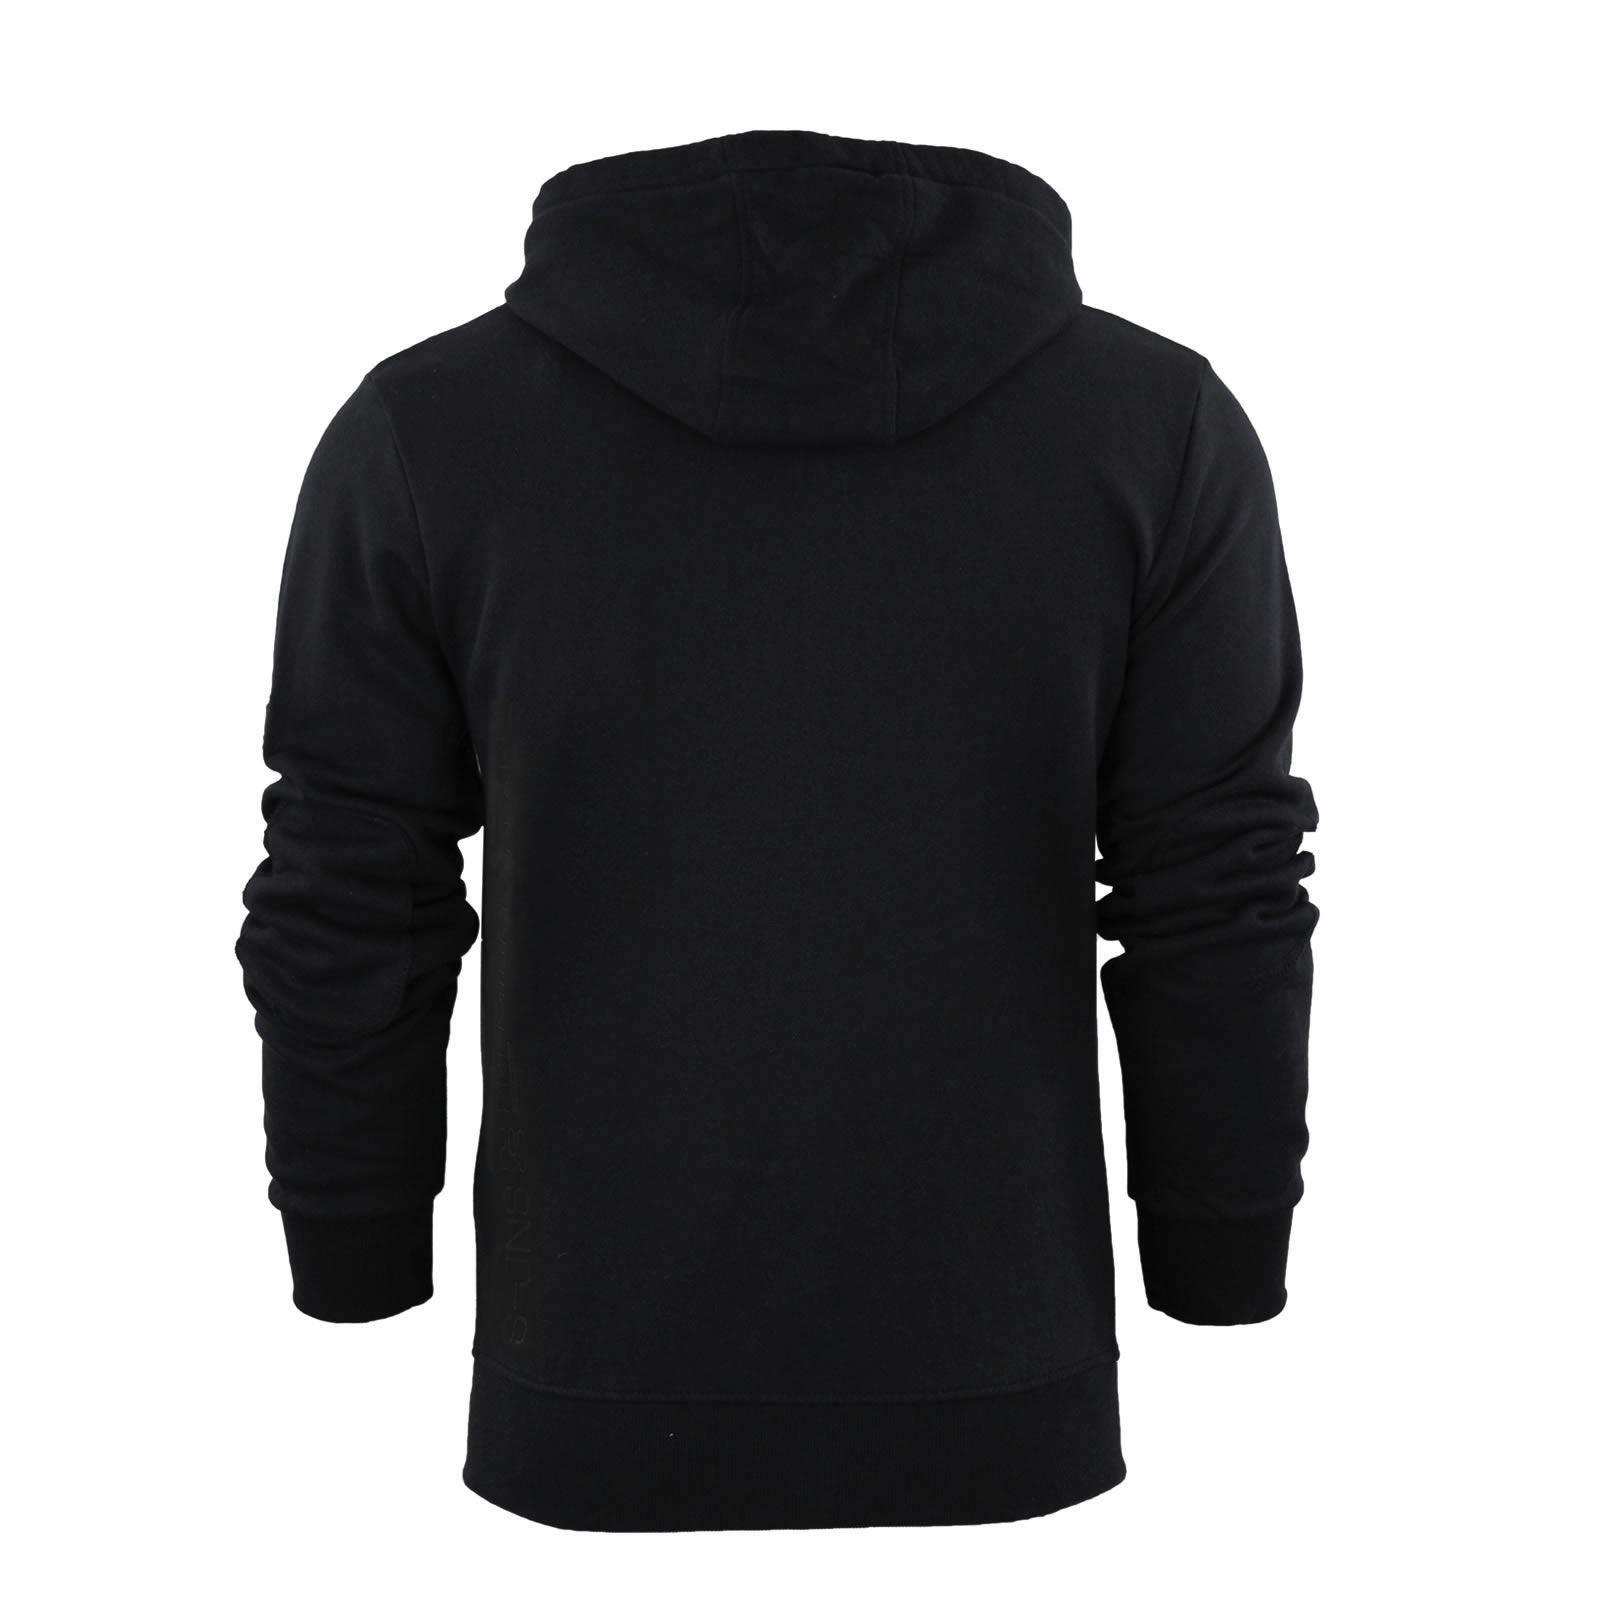 Mens-Hoodie-Smith-amp-Jones-Zip-Up-Hooded-Sweater-Jumper thumbnail 3